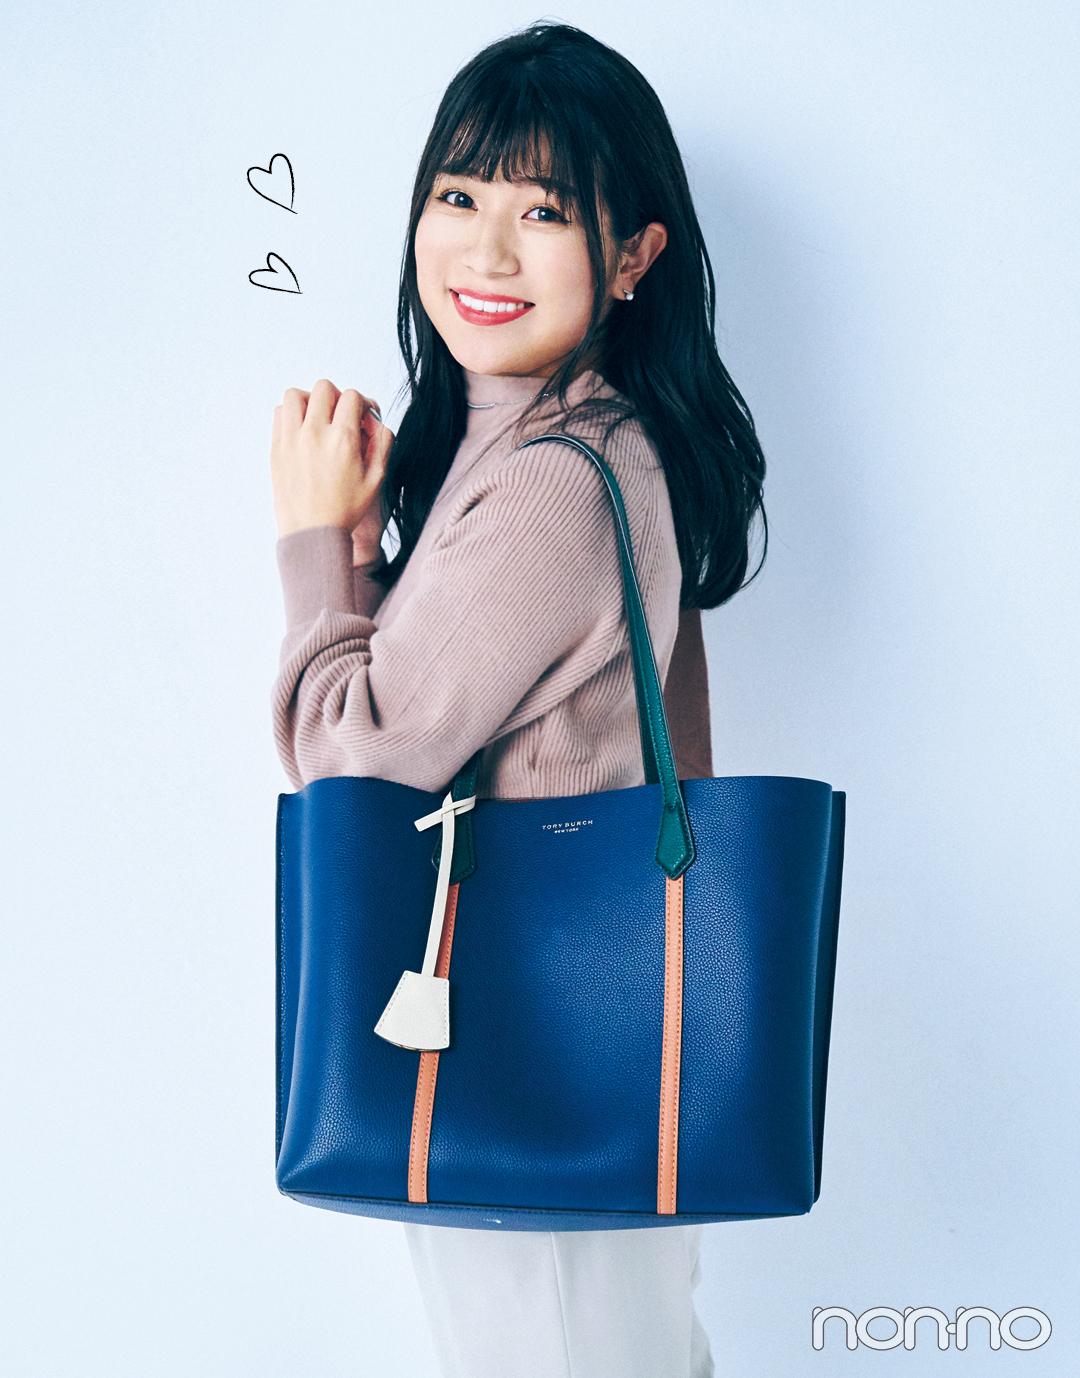 Photo Gallery|新しい日常を支える「バッグの中身」大調査! _1_5